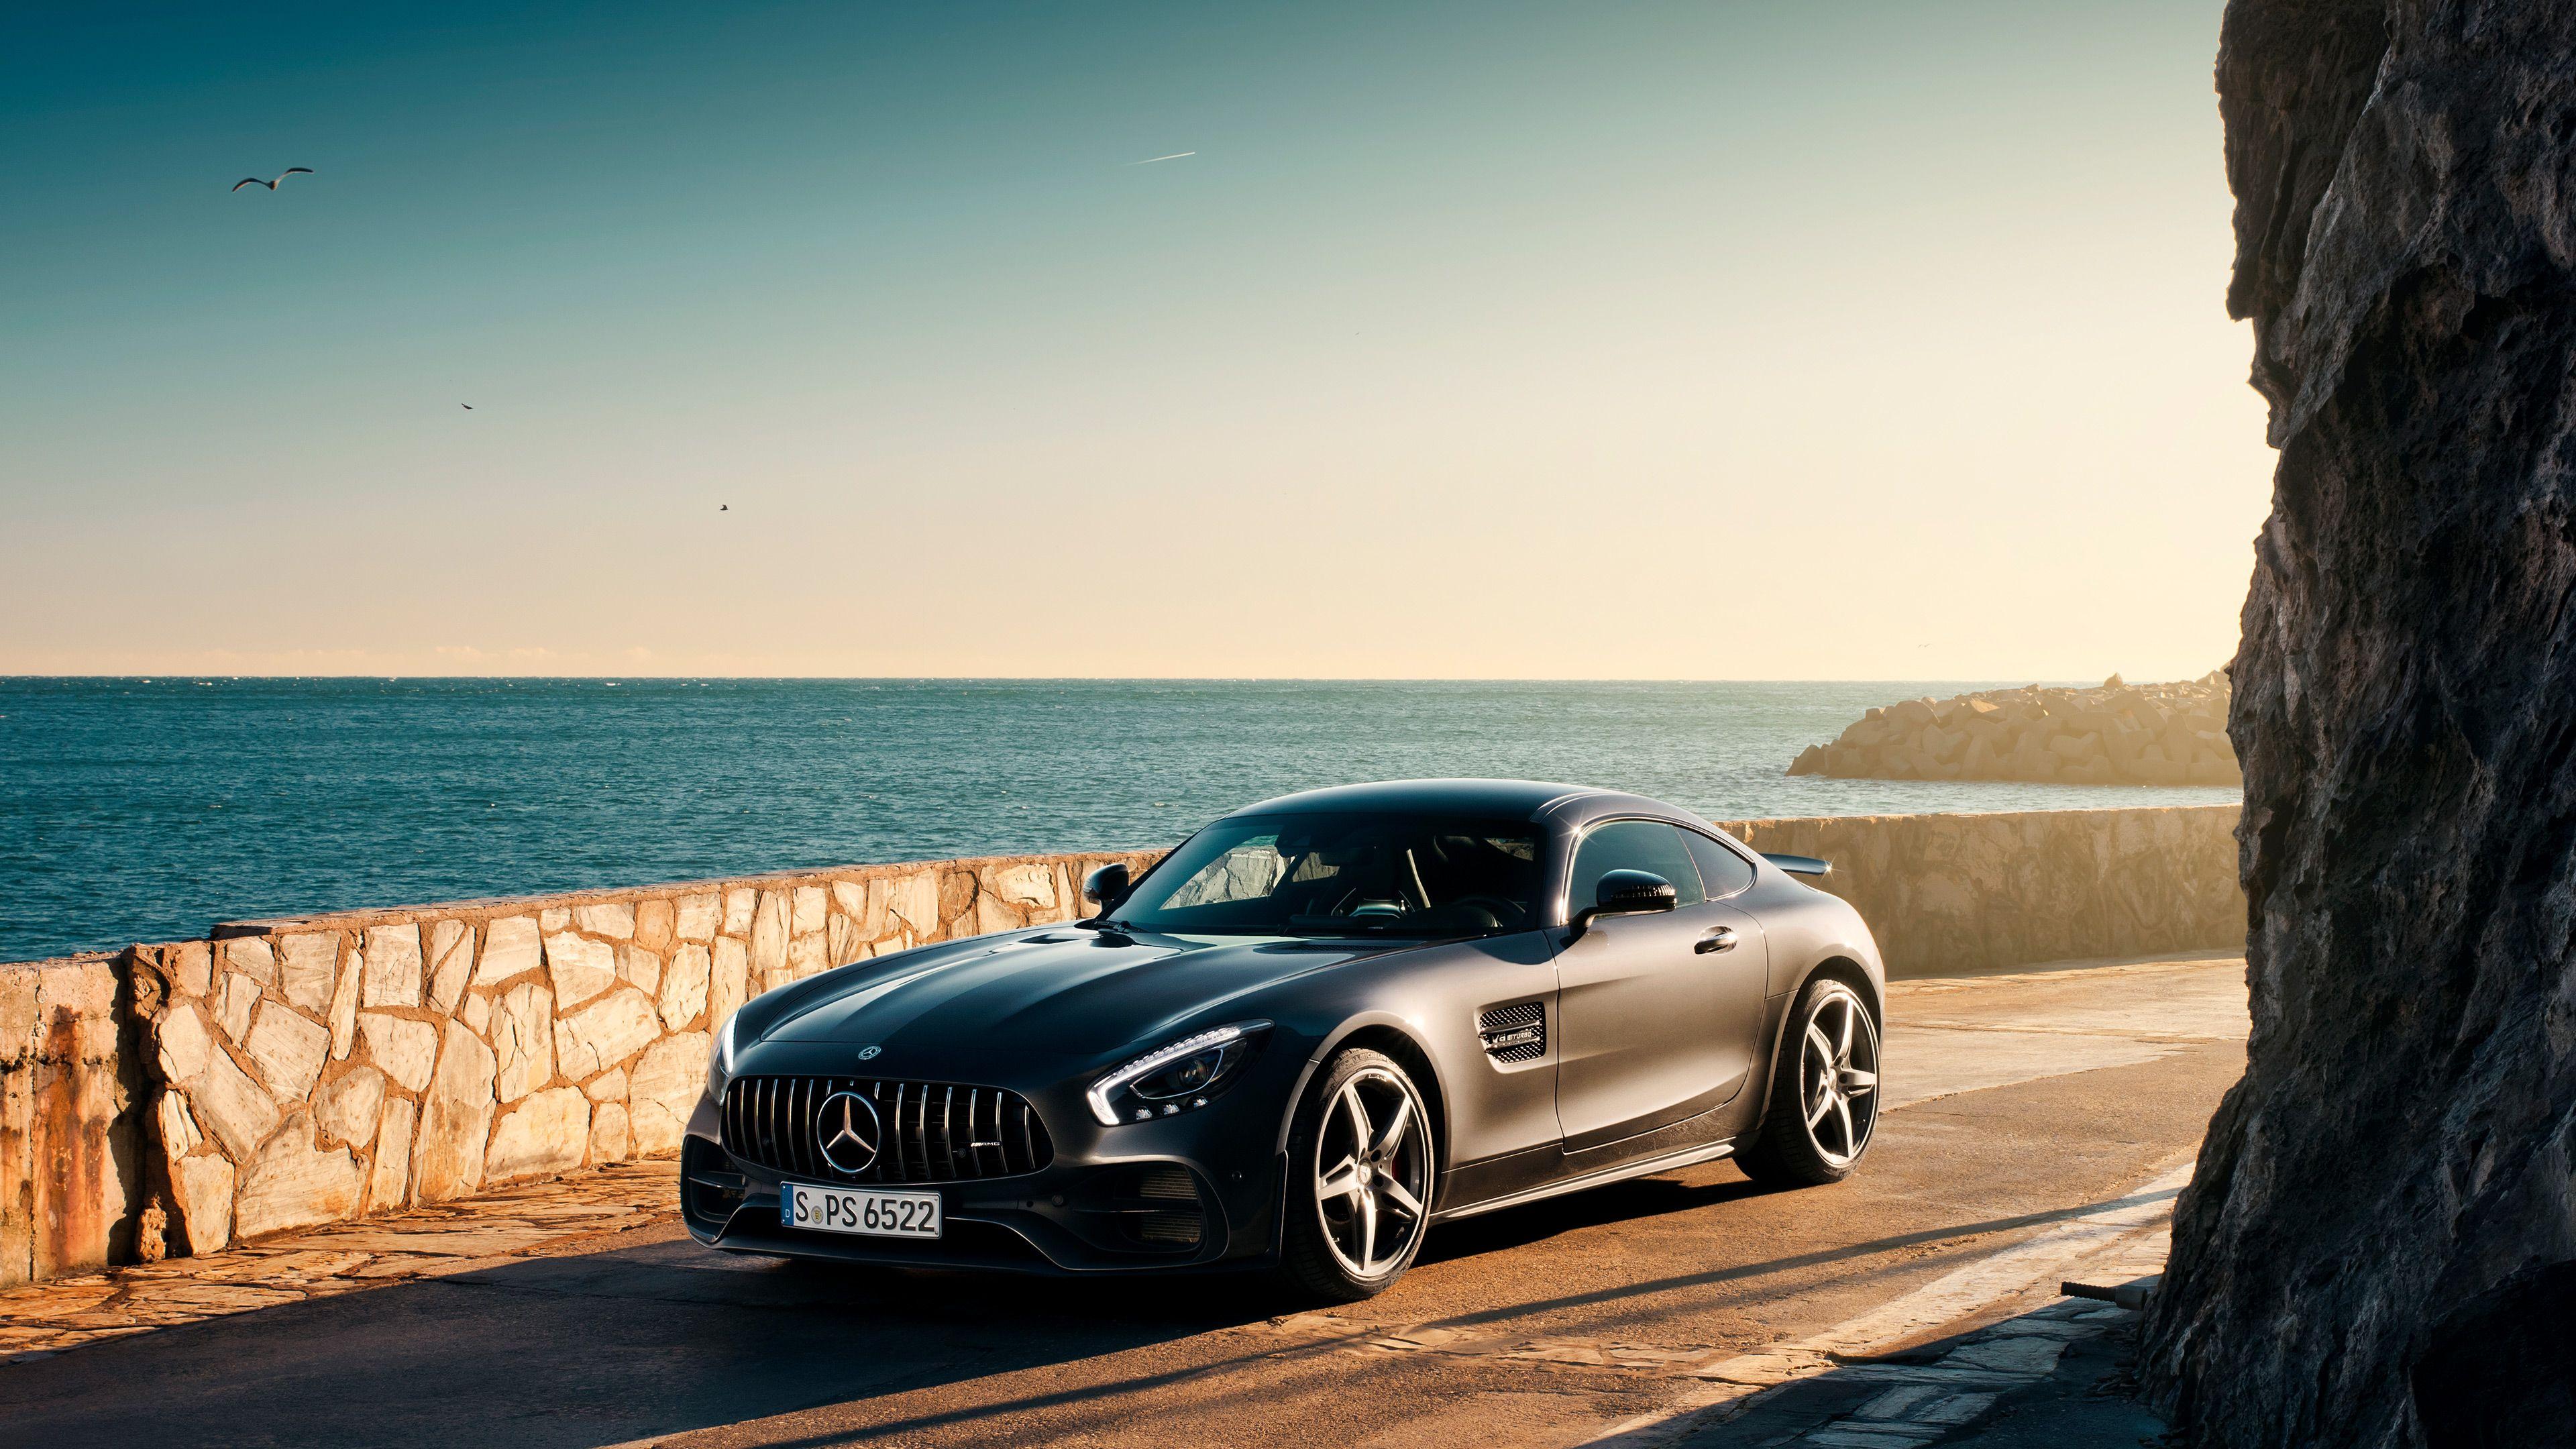 Wallpaper 4k Black Mercedes Benz Amg Gt 4k 2019 Cars Wallpapers